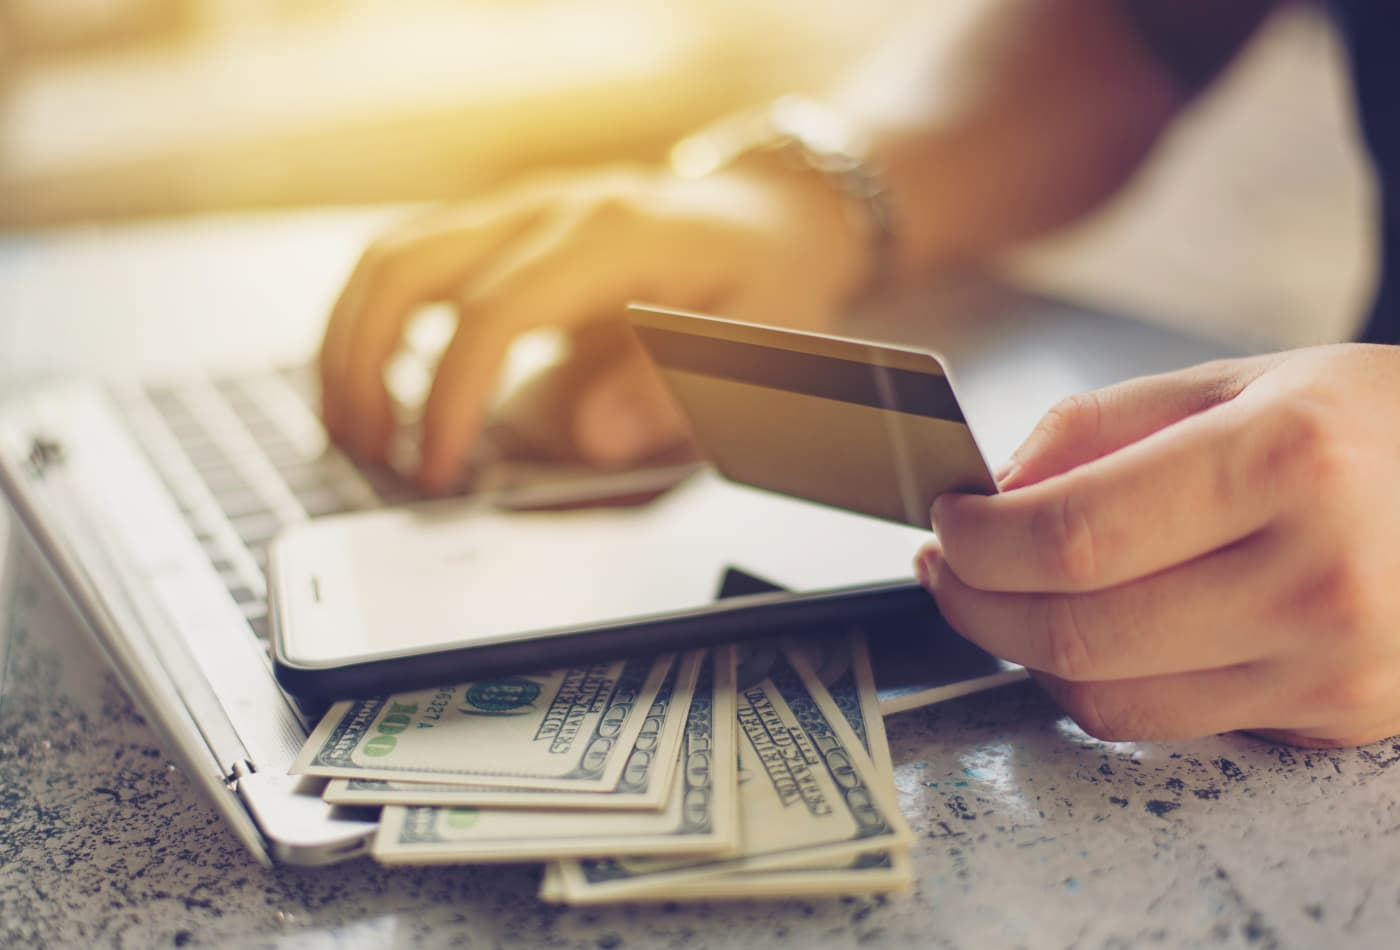 Consumer debt hits new record of $14.3 trillion…